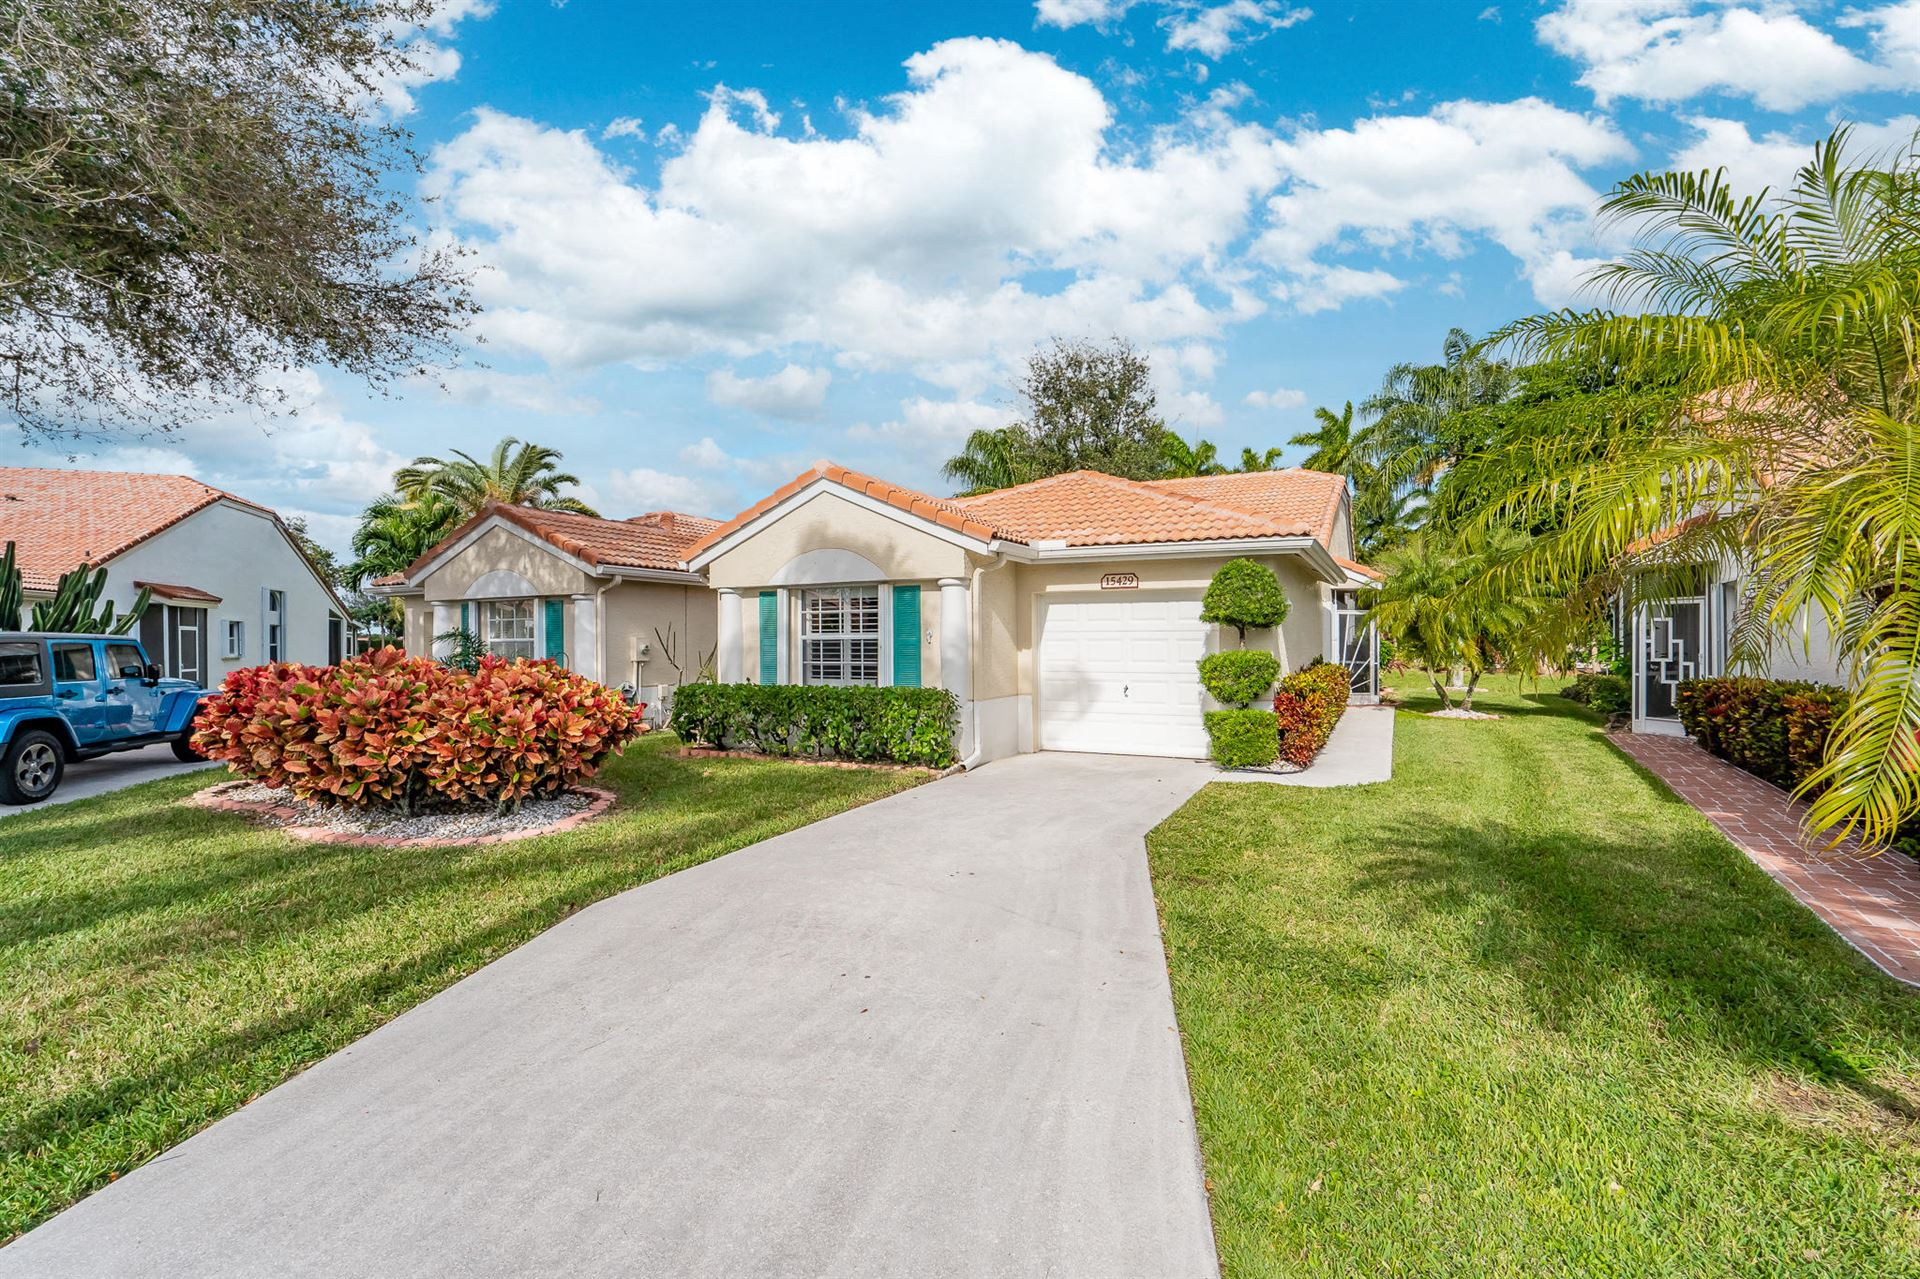 Photo of 15429 Lake Gardenia Place, Delray Beach, FL 33484 (MLS # RX-10675780)